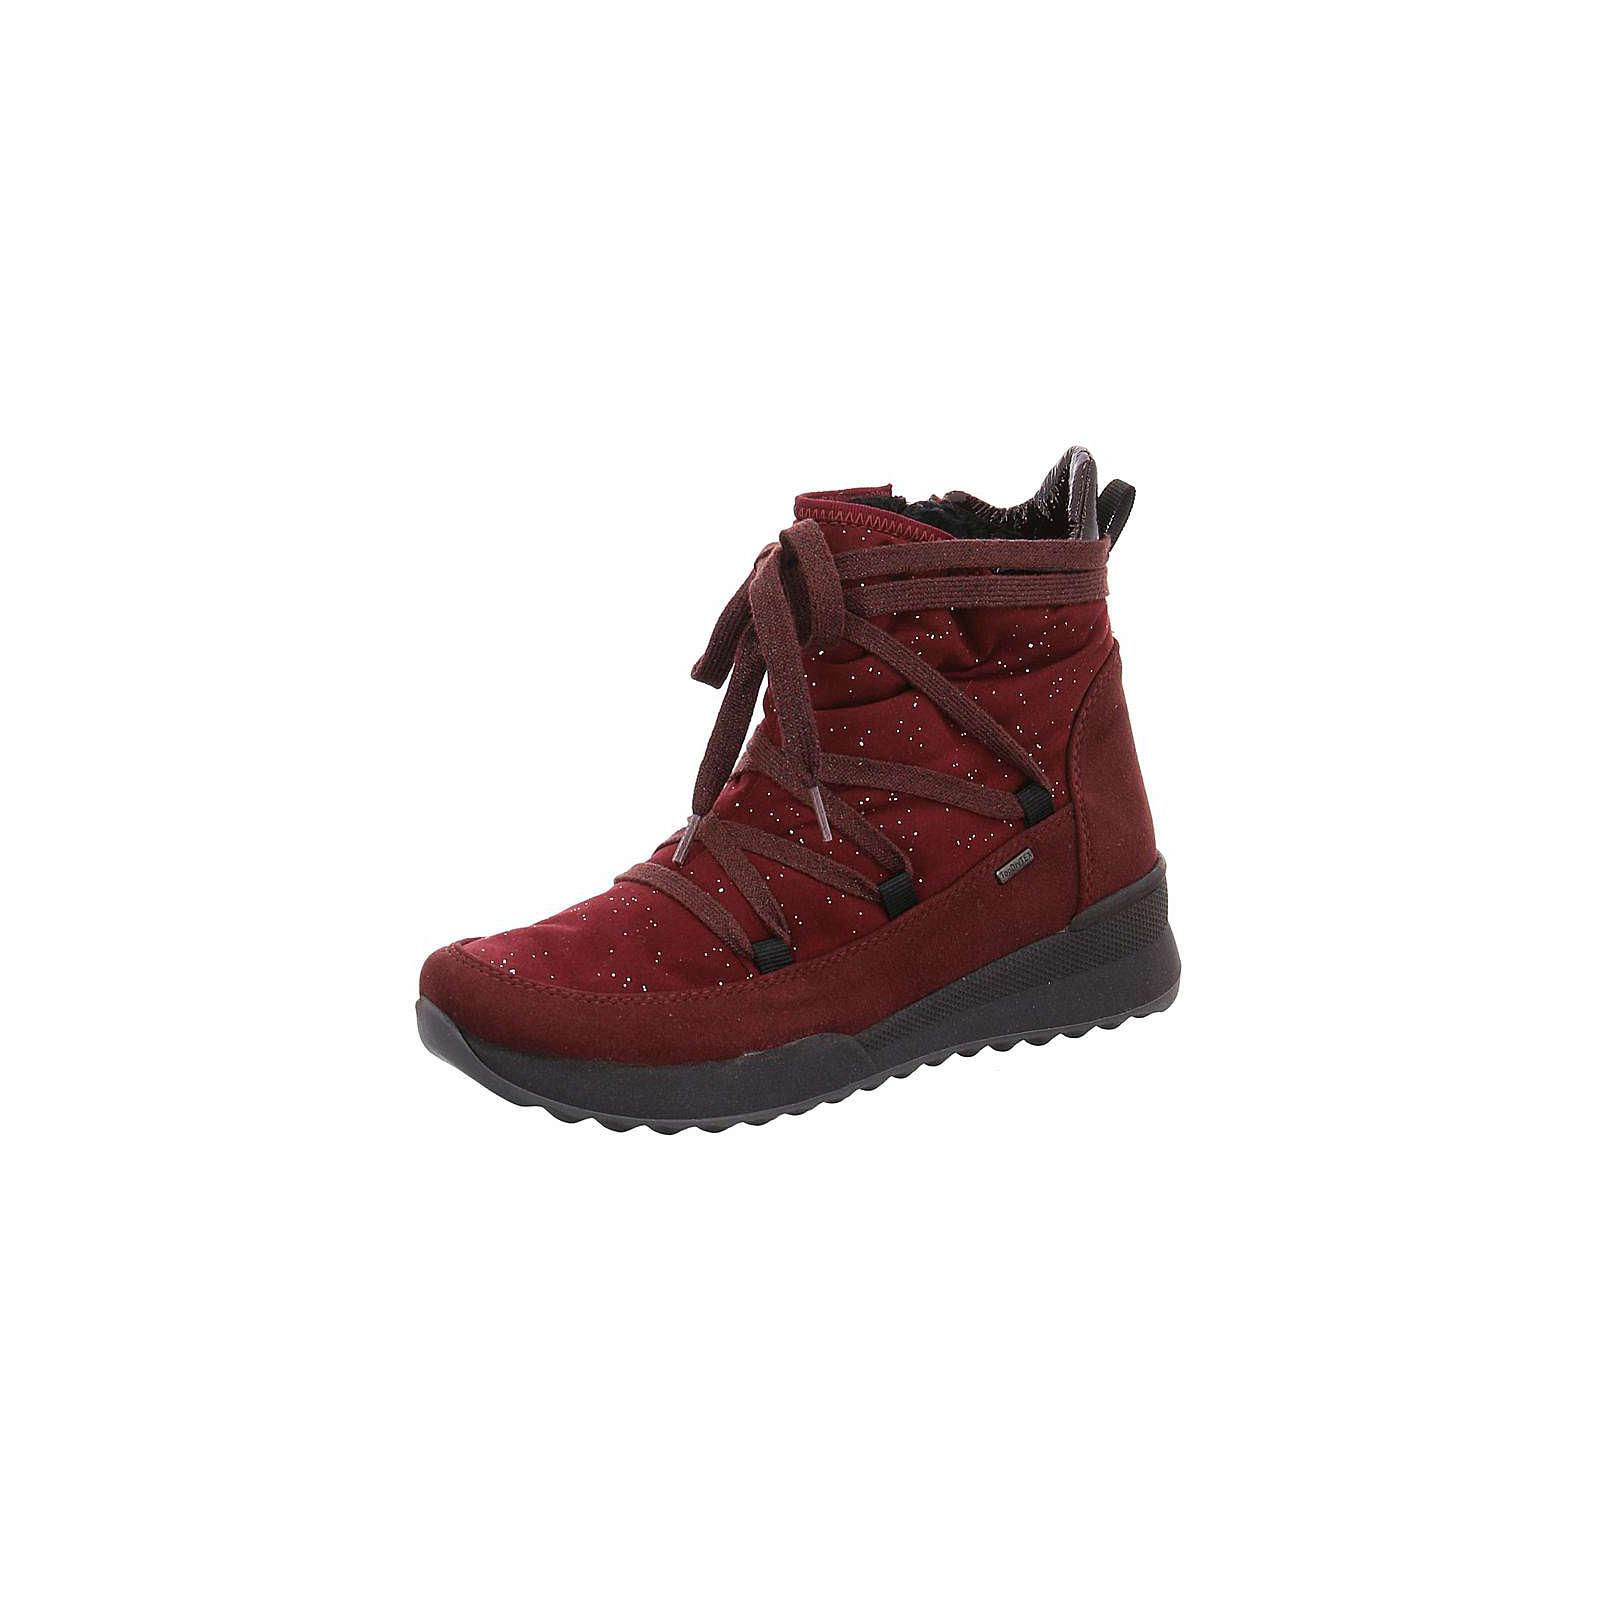 ROMIKA Stiefel rot rot Damen Gr. 37